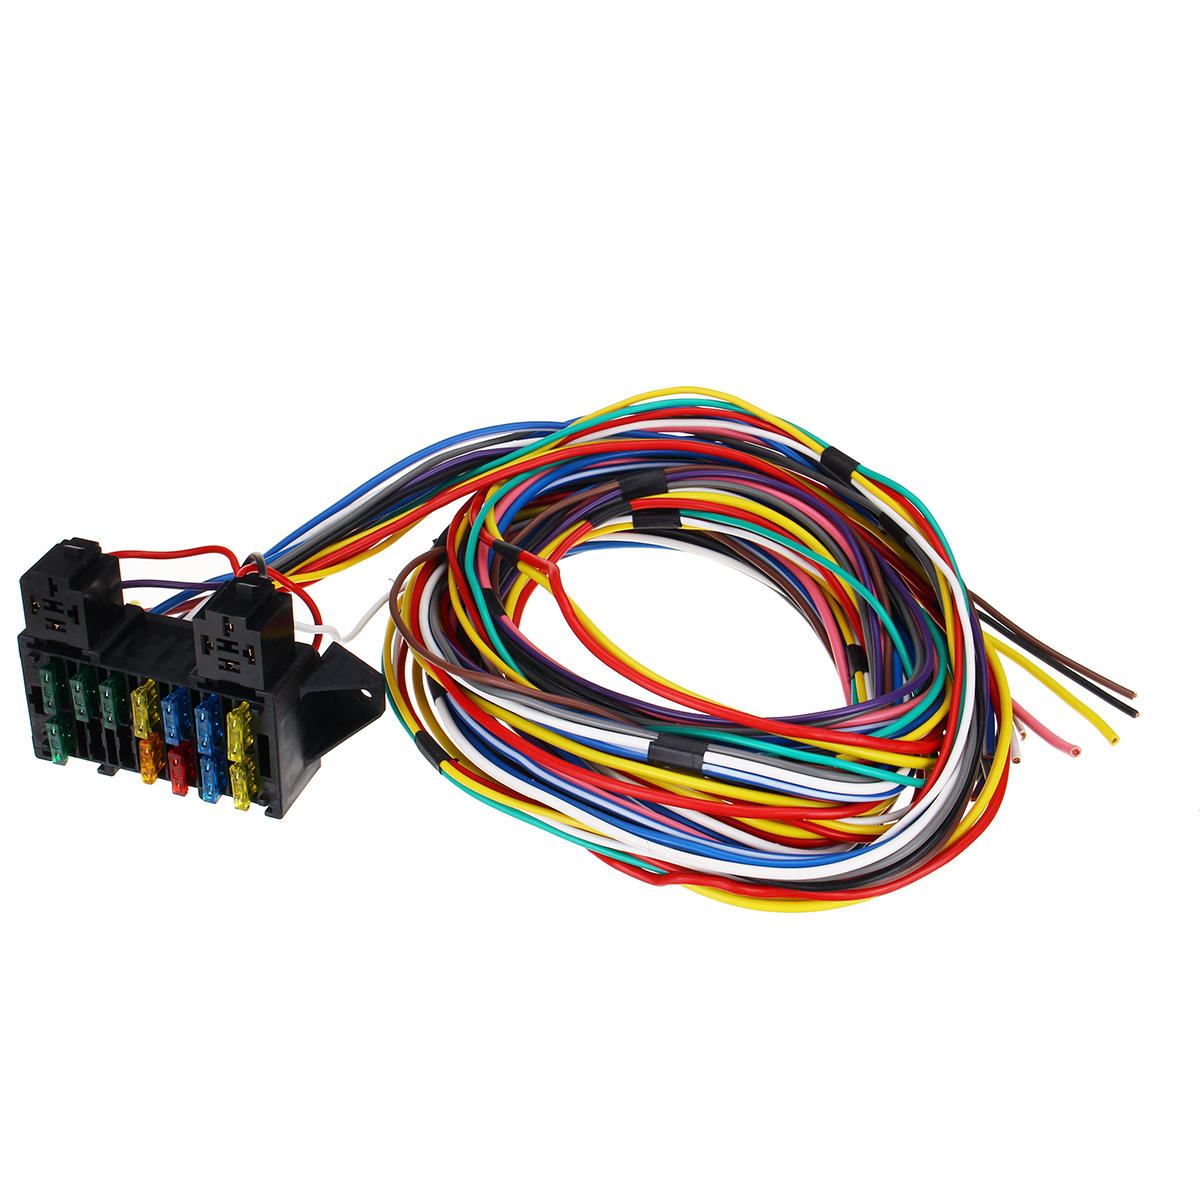 14 Circuit Universal Wiring Harness Bumper Wire Kit 12v Durability Car Hot Rod Street